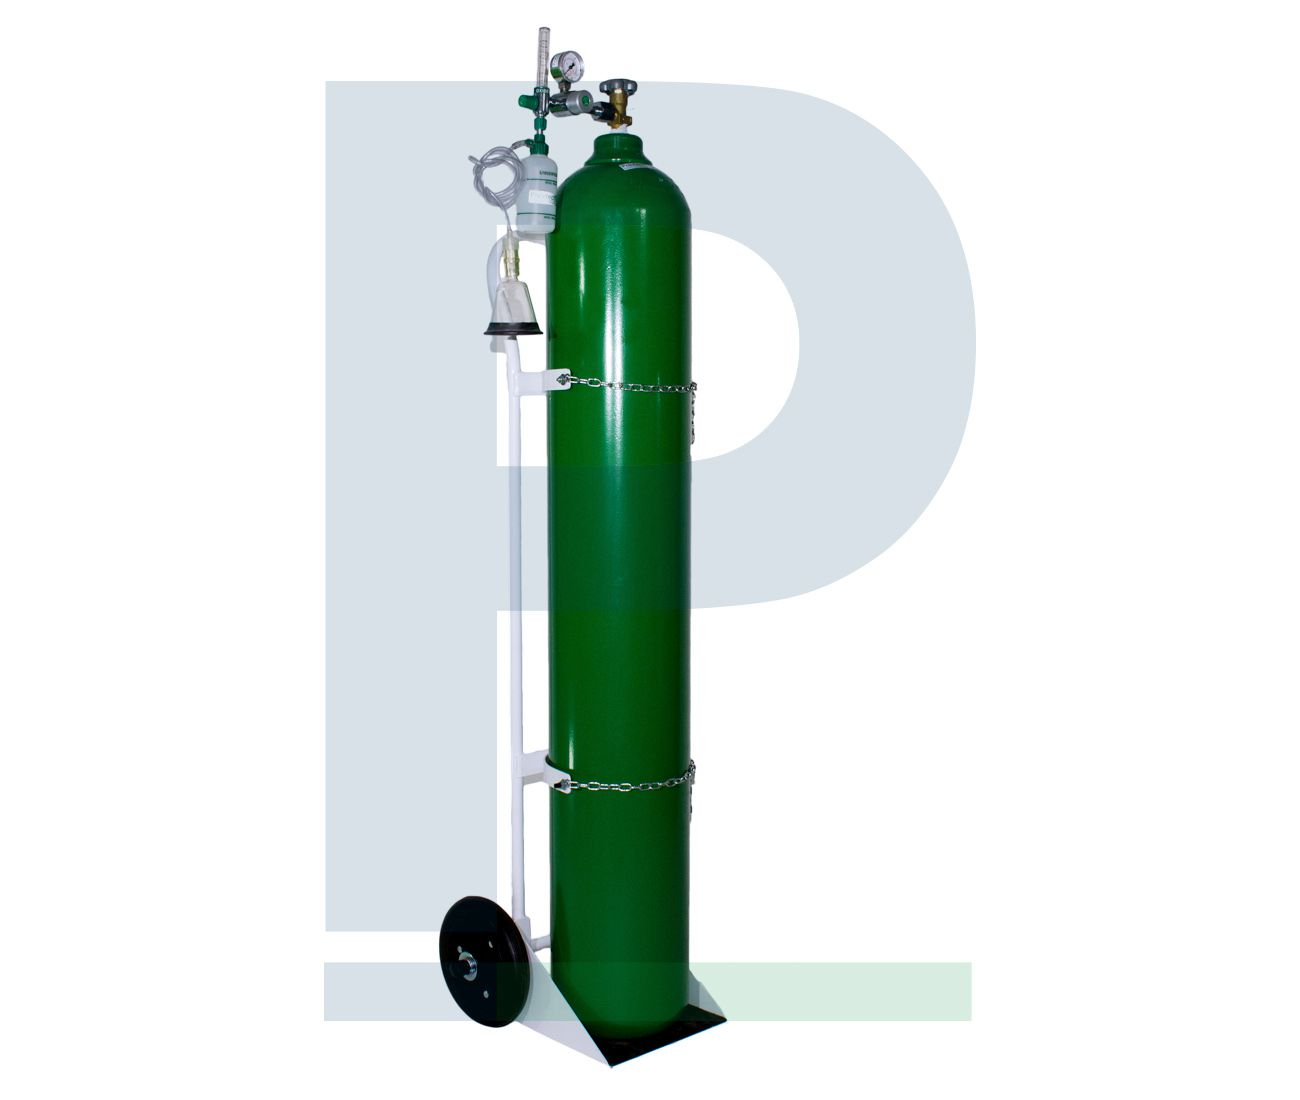 Kit Cilindro 50 Litros para Oxigênio